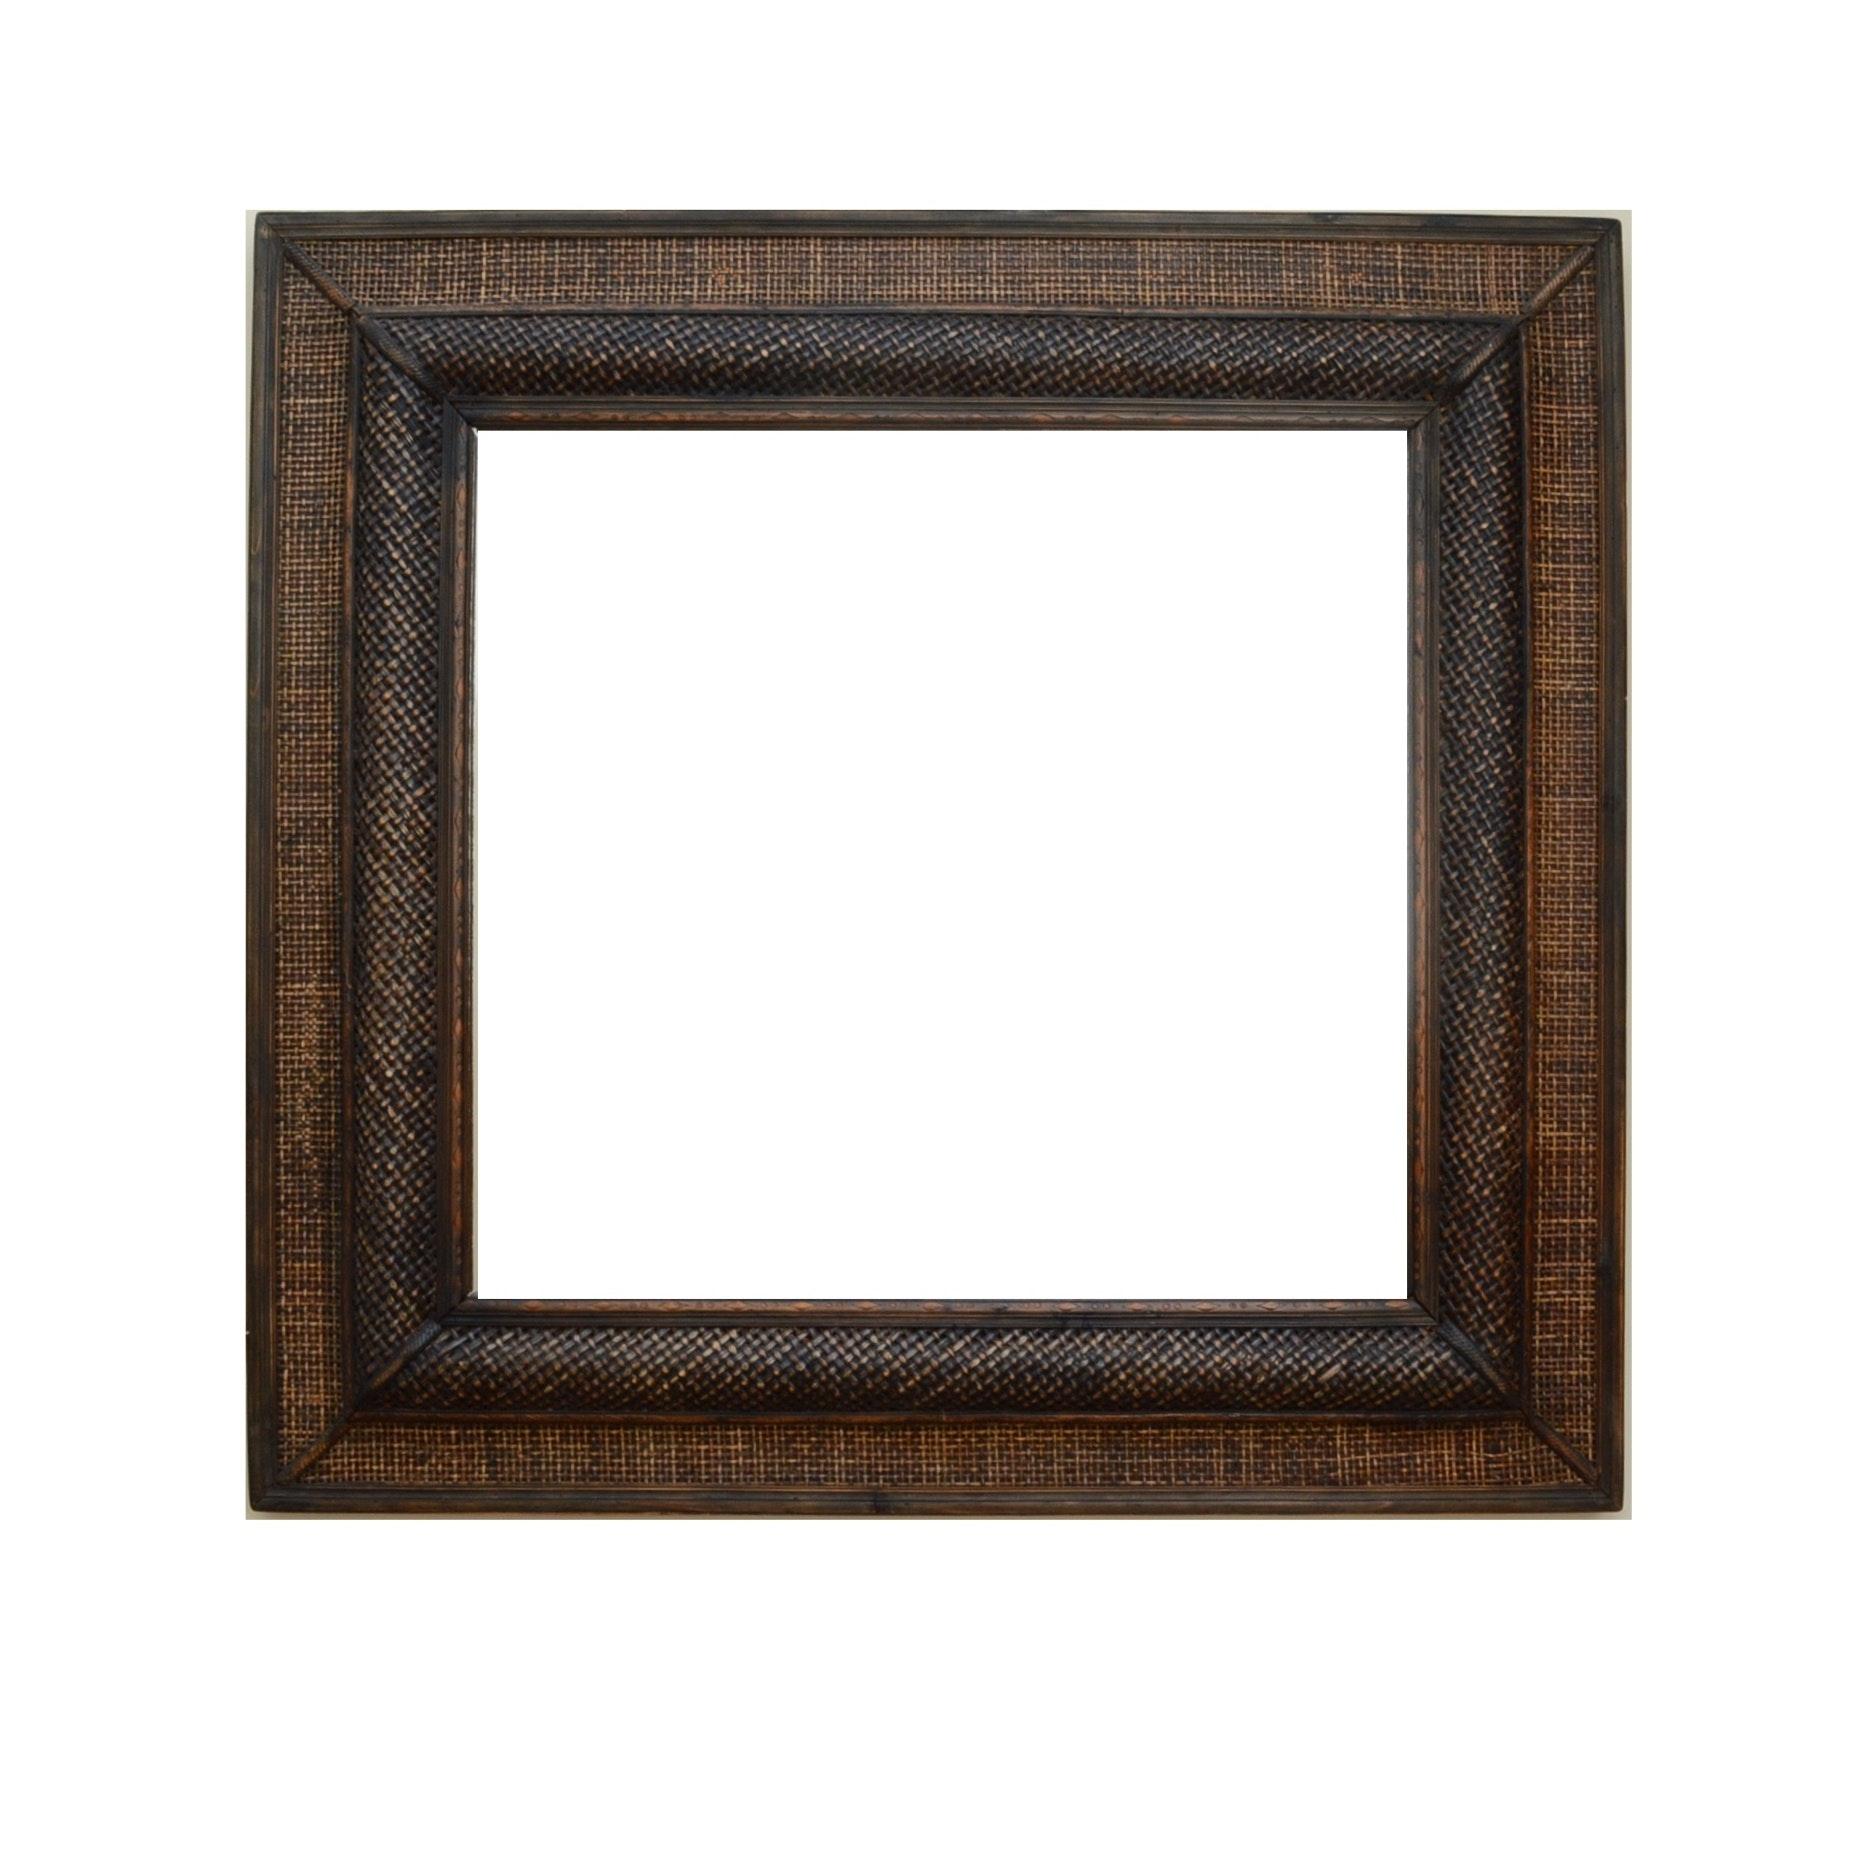 Bevel-Edged Wall Mirror